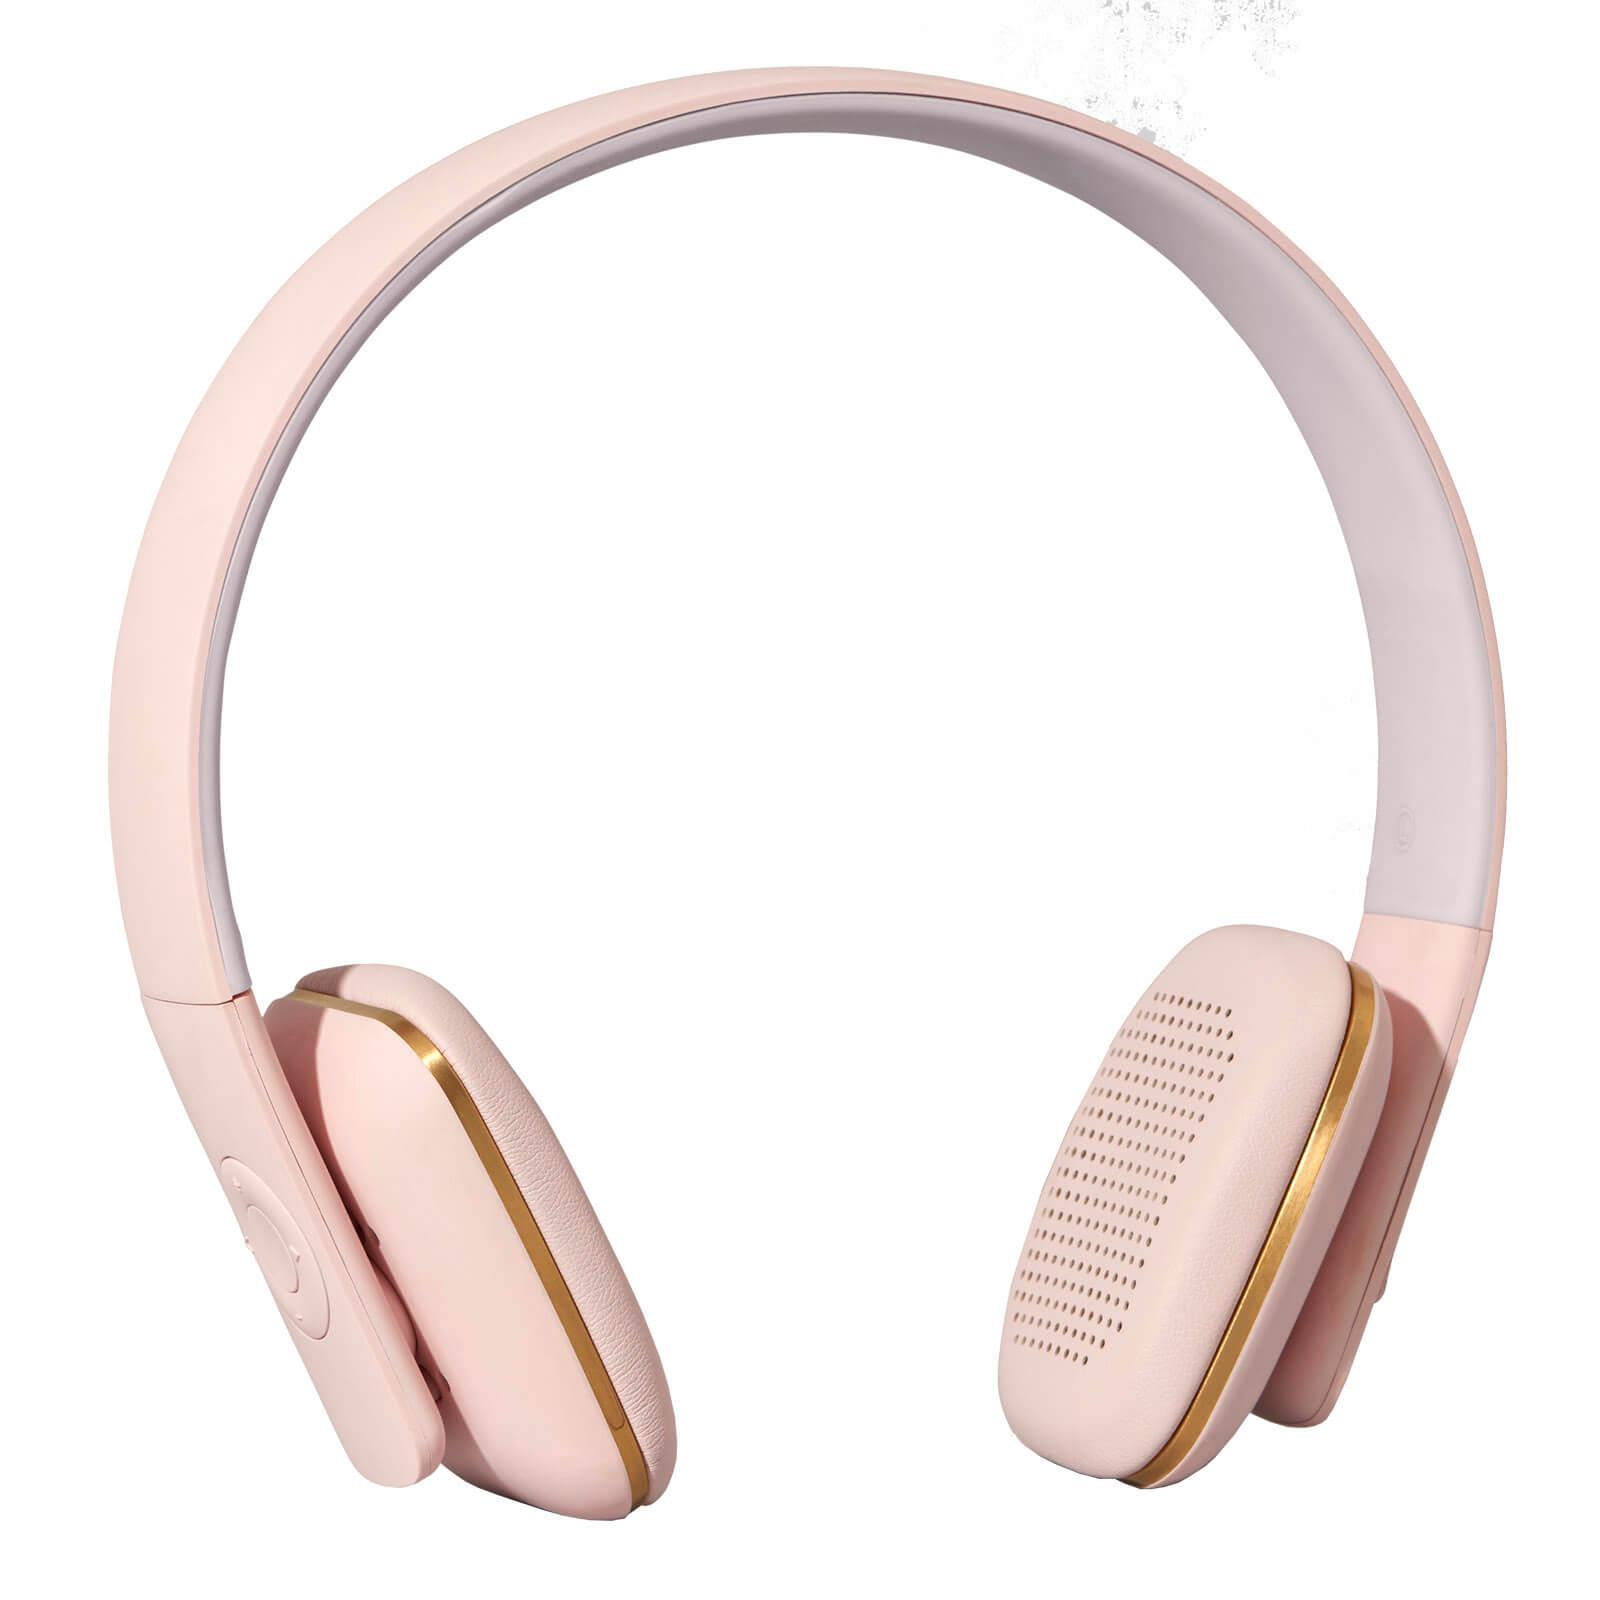 Kreafunk aHEAD Bluetooth Headphones - Dusty Pink